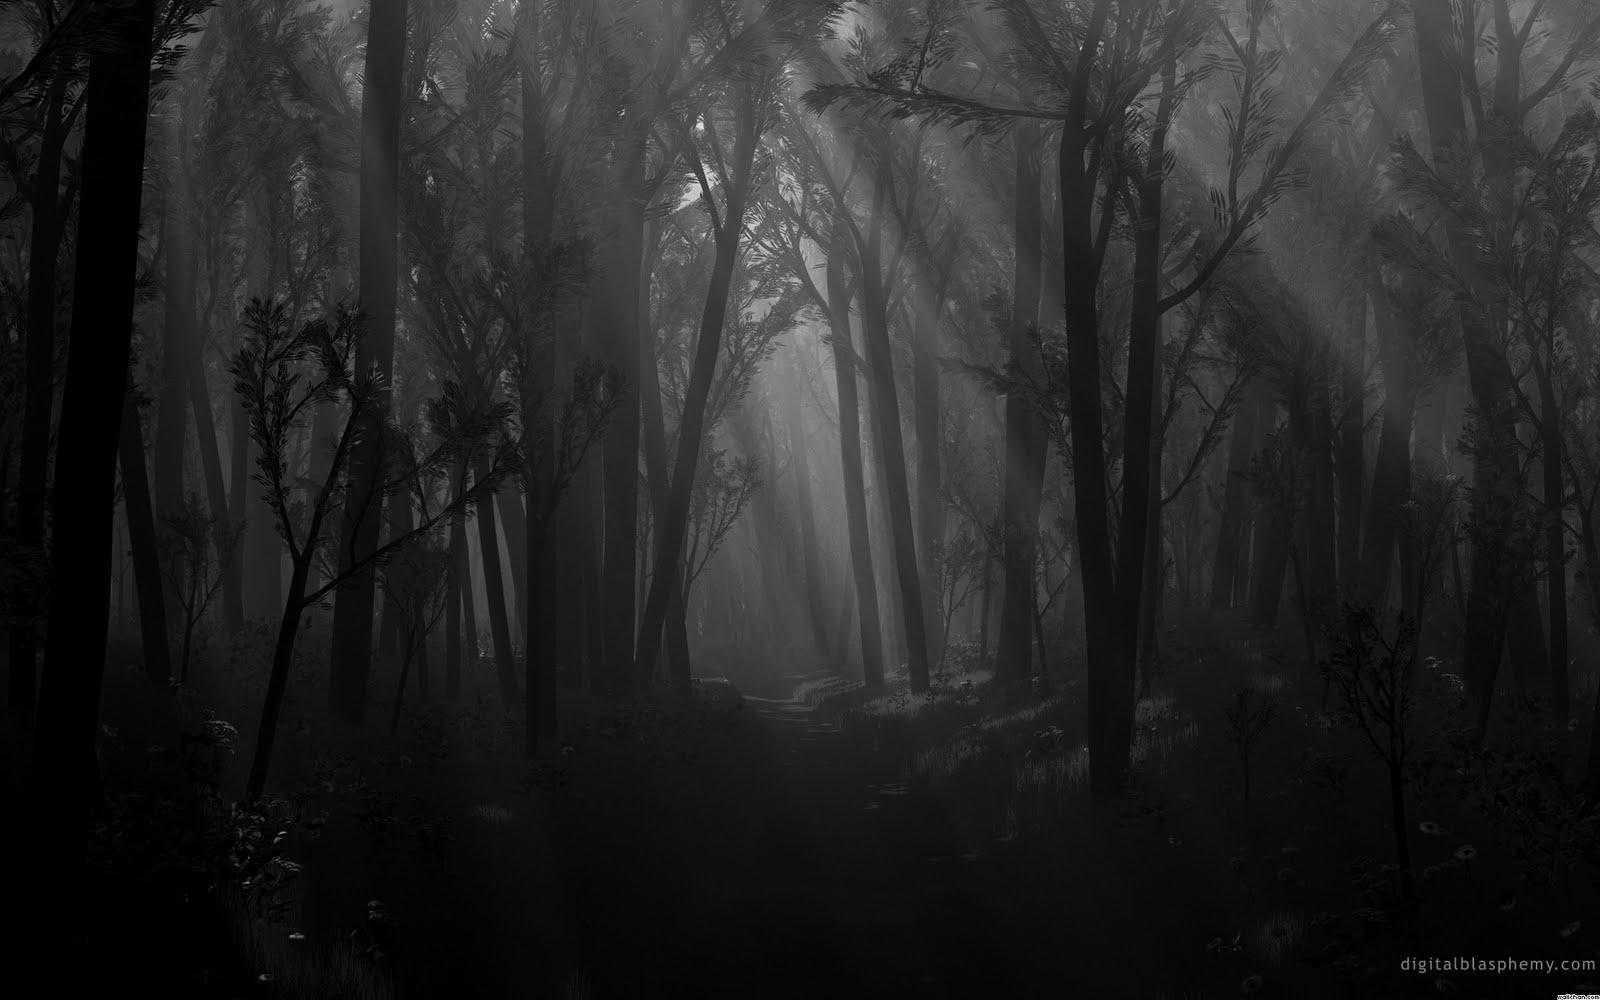 dark forest path shadows spooky monochrome wallpaper wallpaperjpg 1600x1000